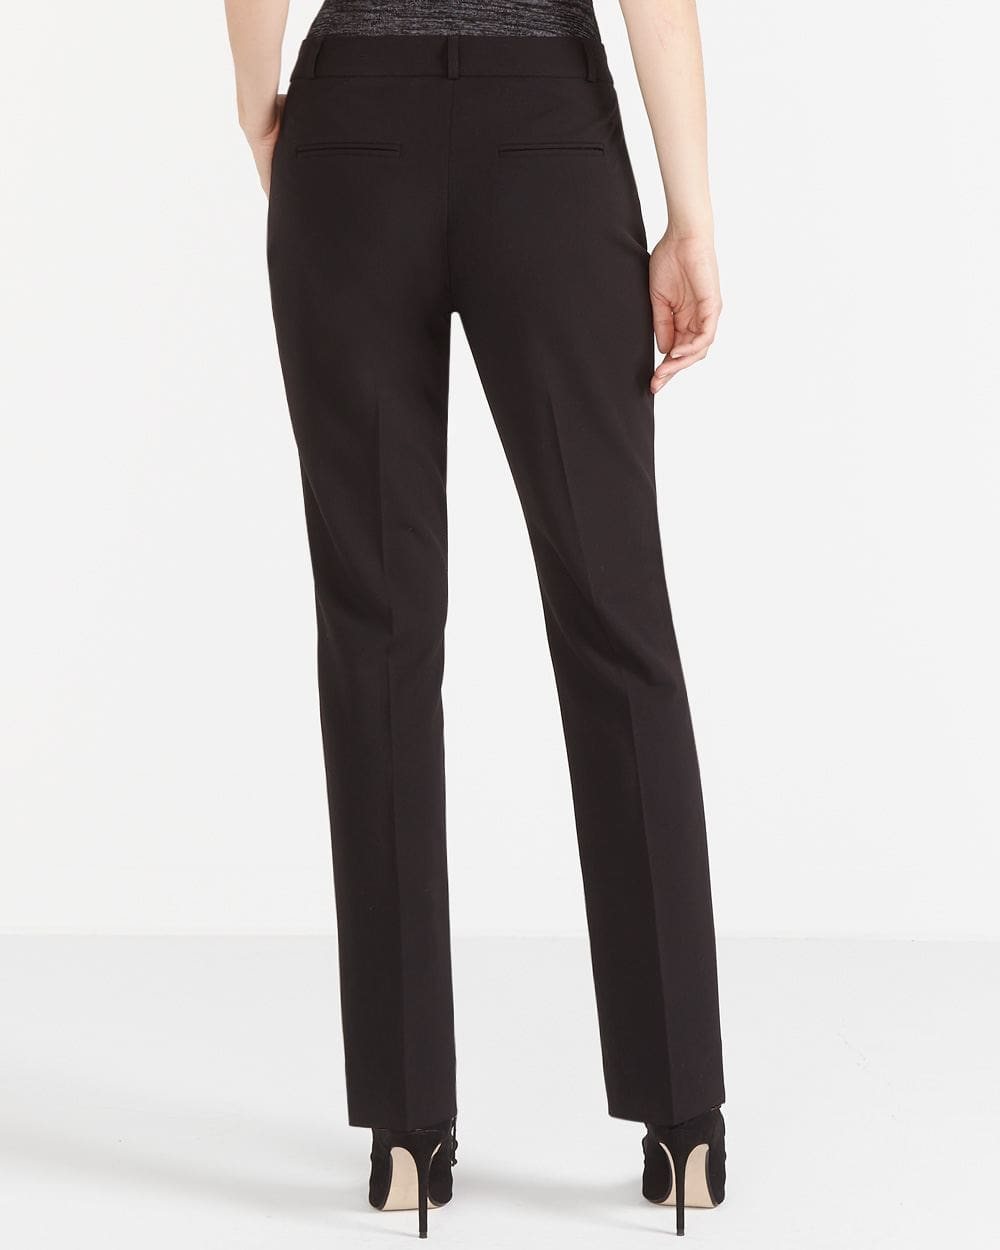 The Petite New Classic Straight Leg Pants